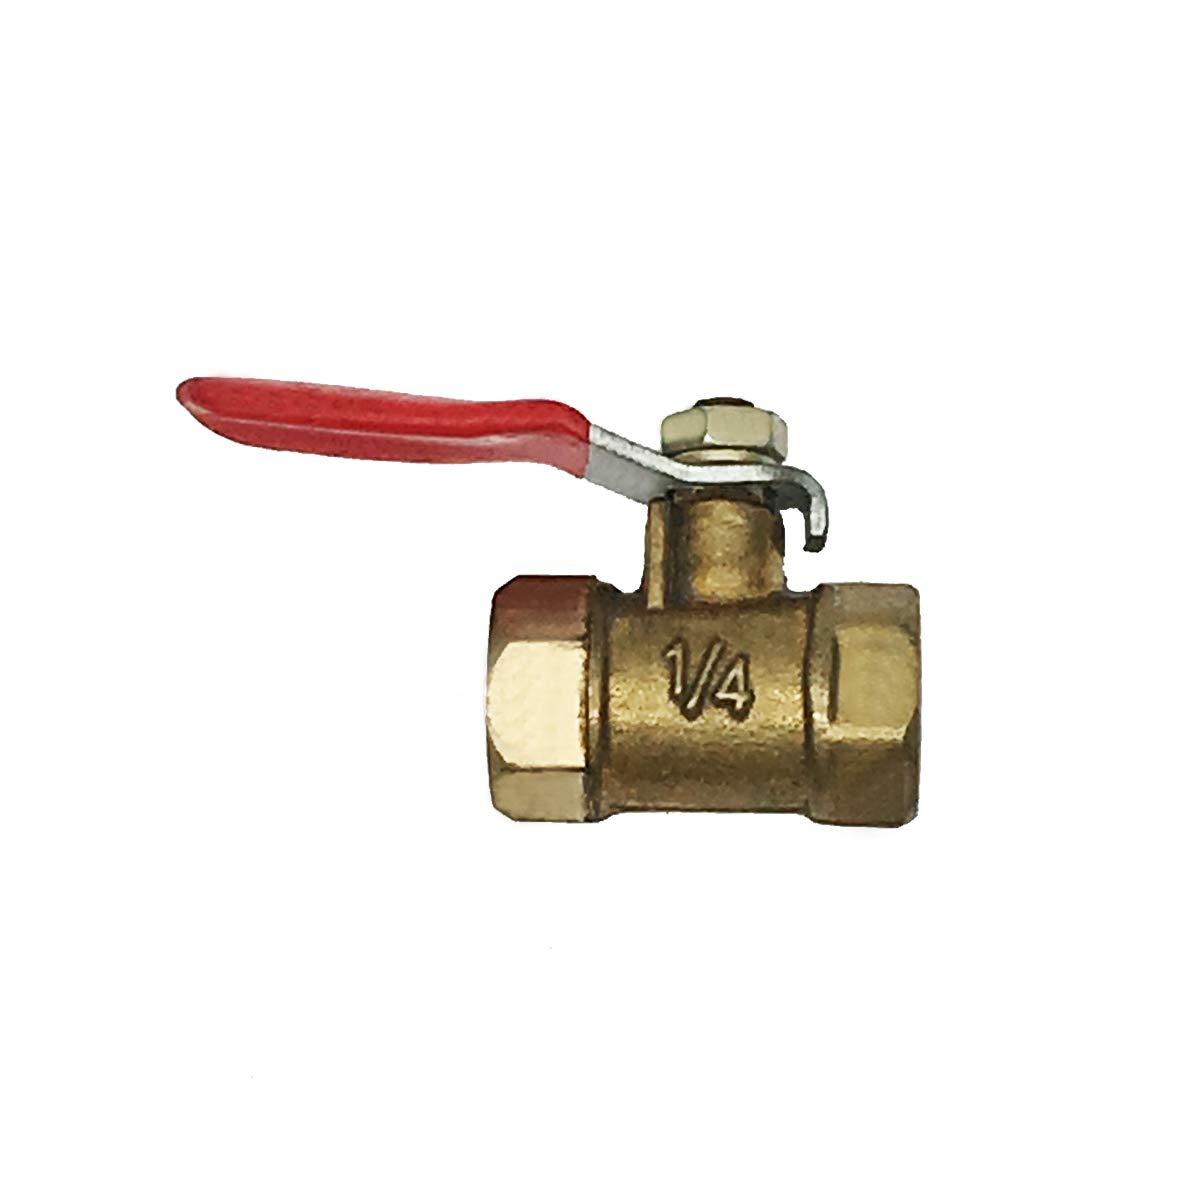 PEX CPVC Push-to-Connect PE-RT COMOK 5Pcs 1//4 Tubes Inline 12mm Thread Water Valve Shut Off Copper